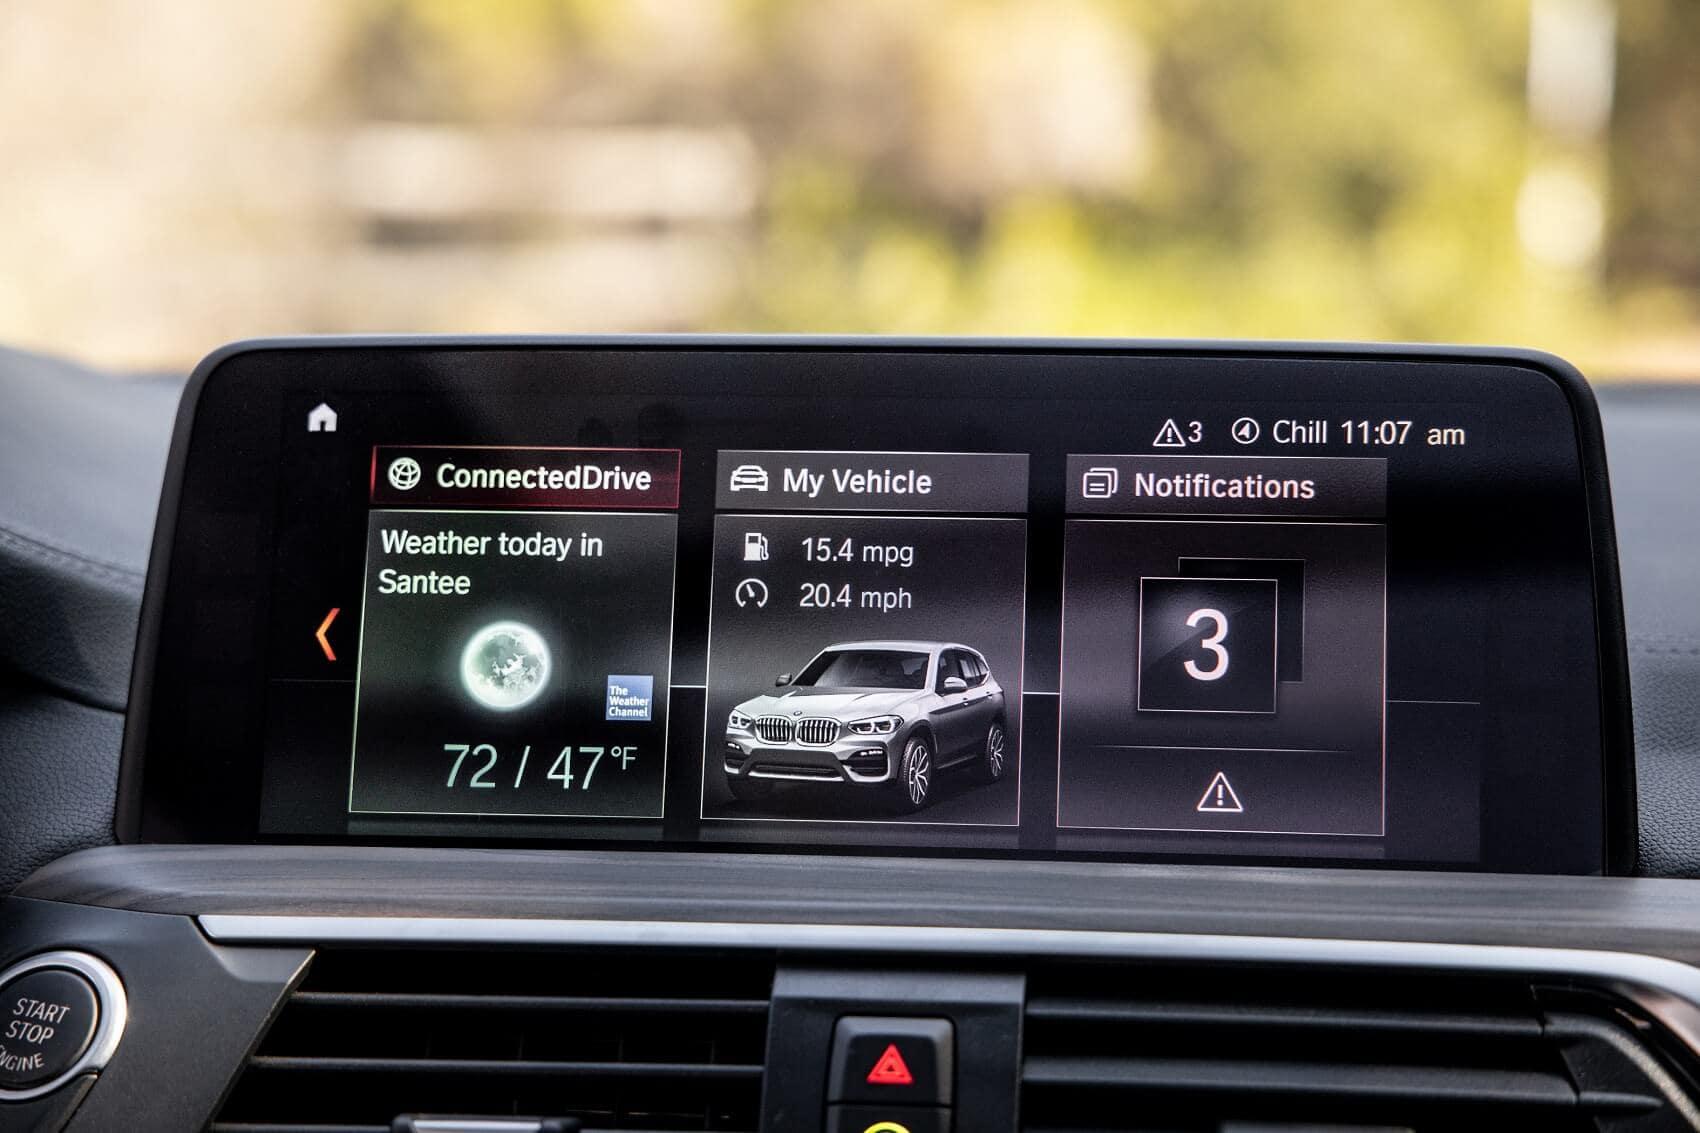 BMW X3 Interior 8.8-inch multimedia touchscreen